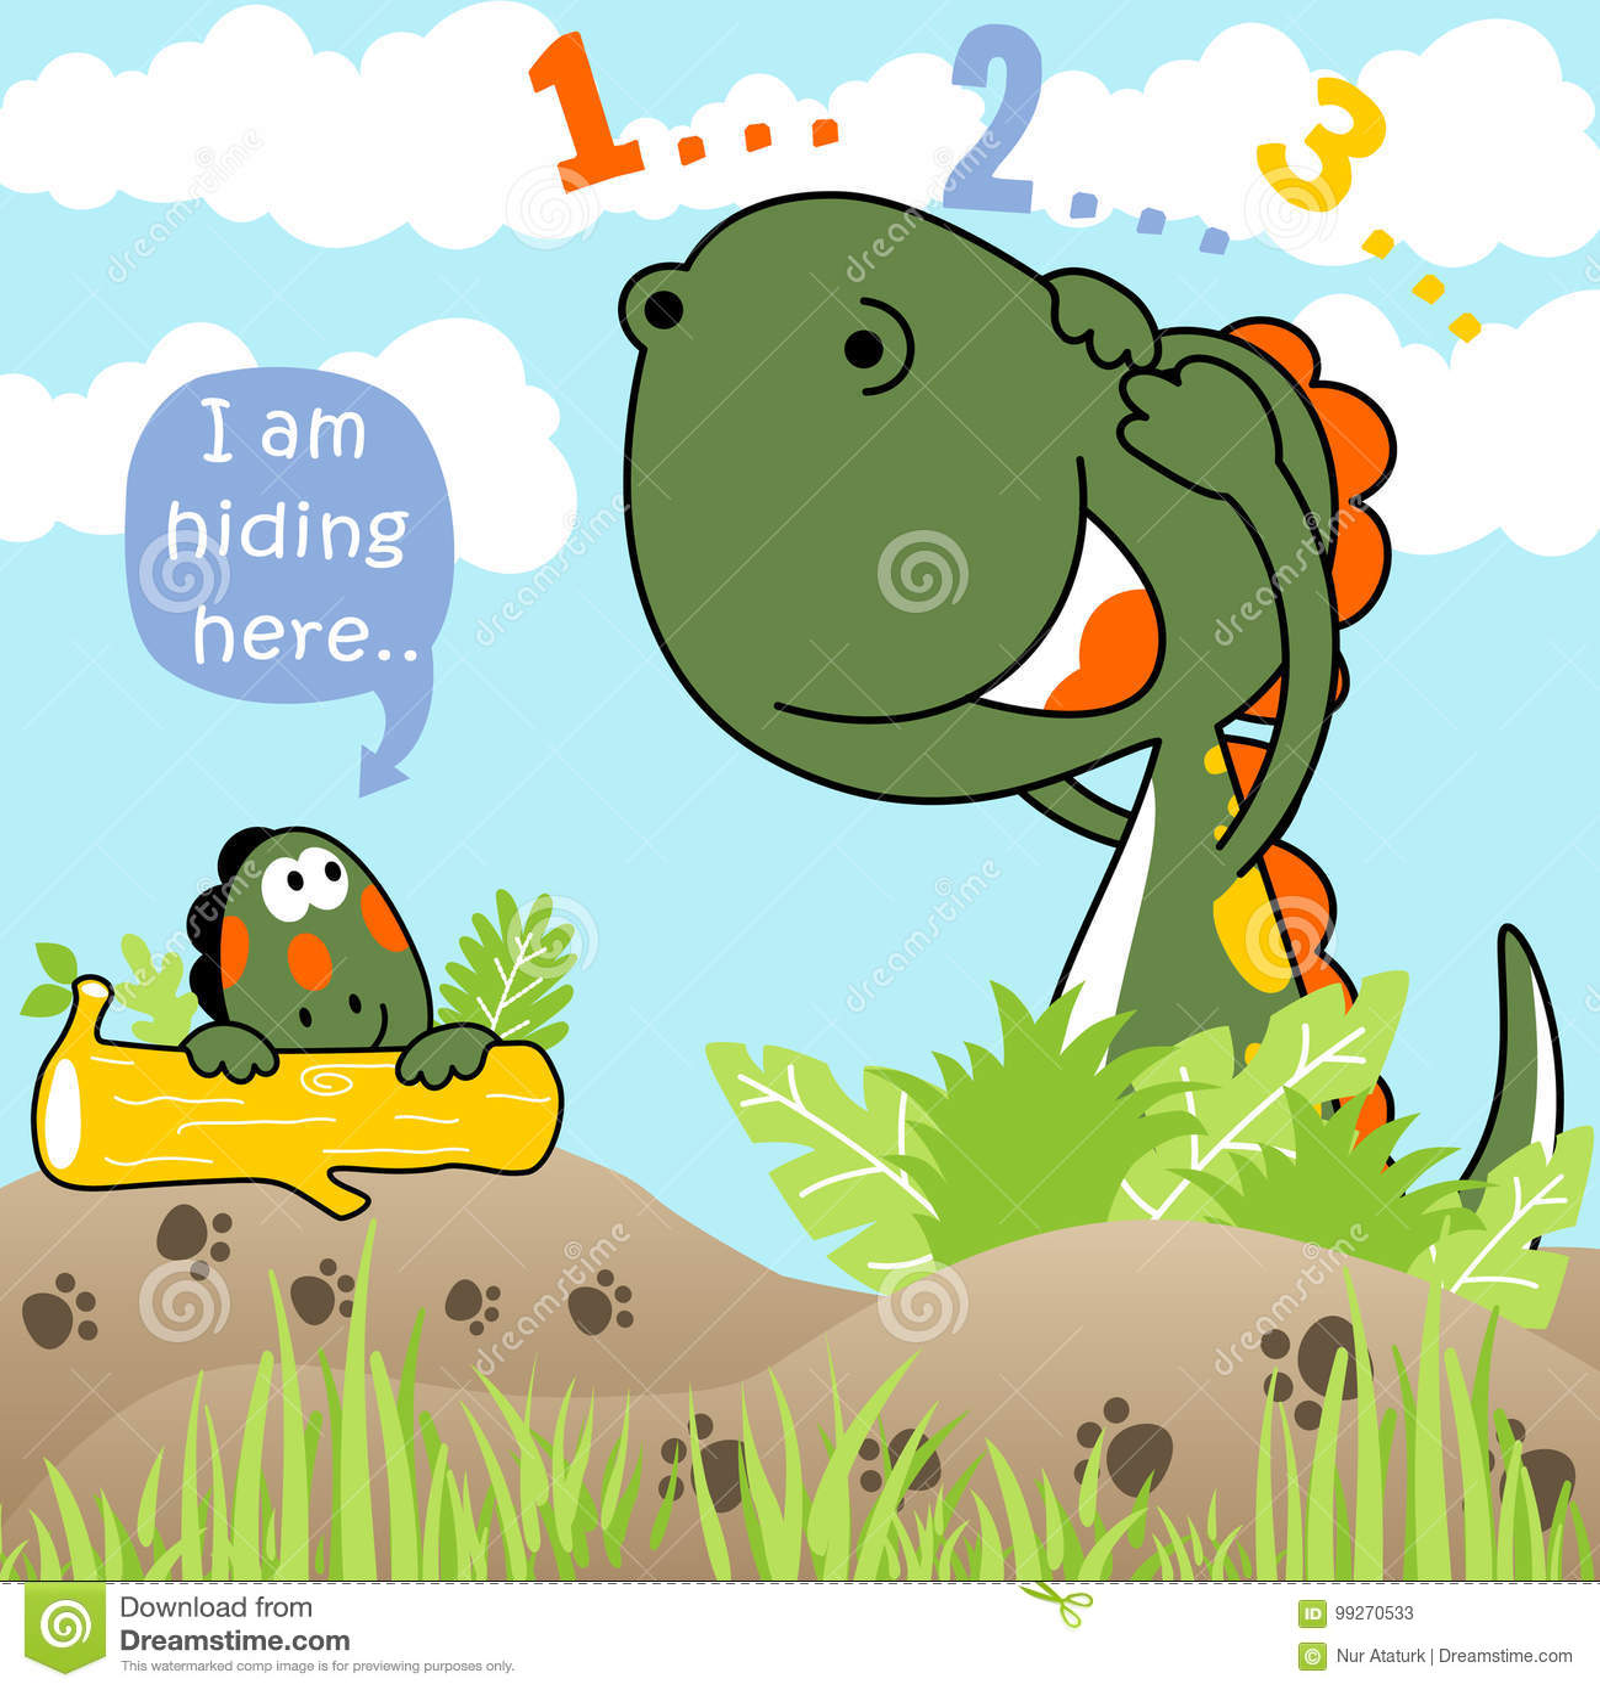 Counting Game Cartoon Illustration Cartoon Vector